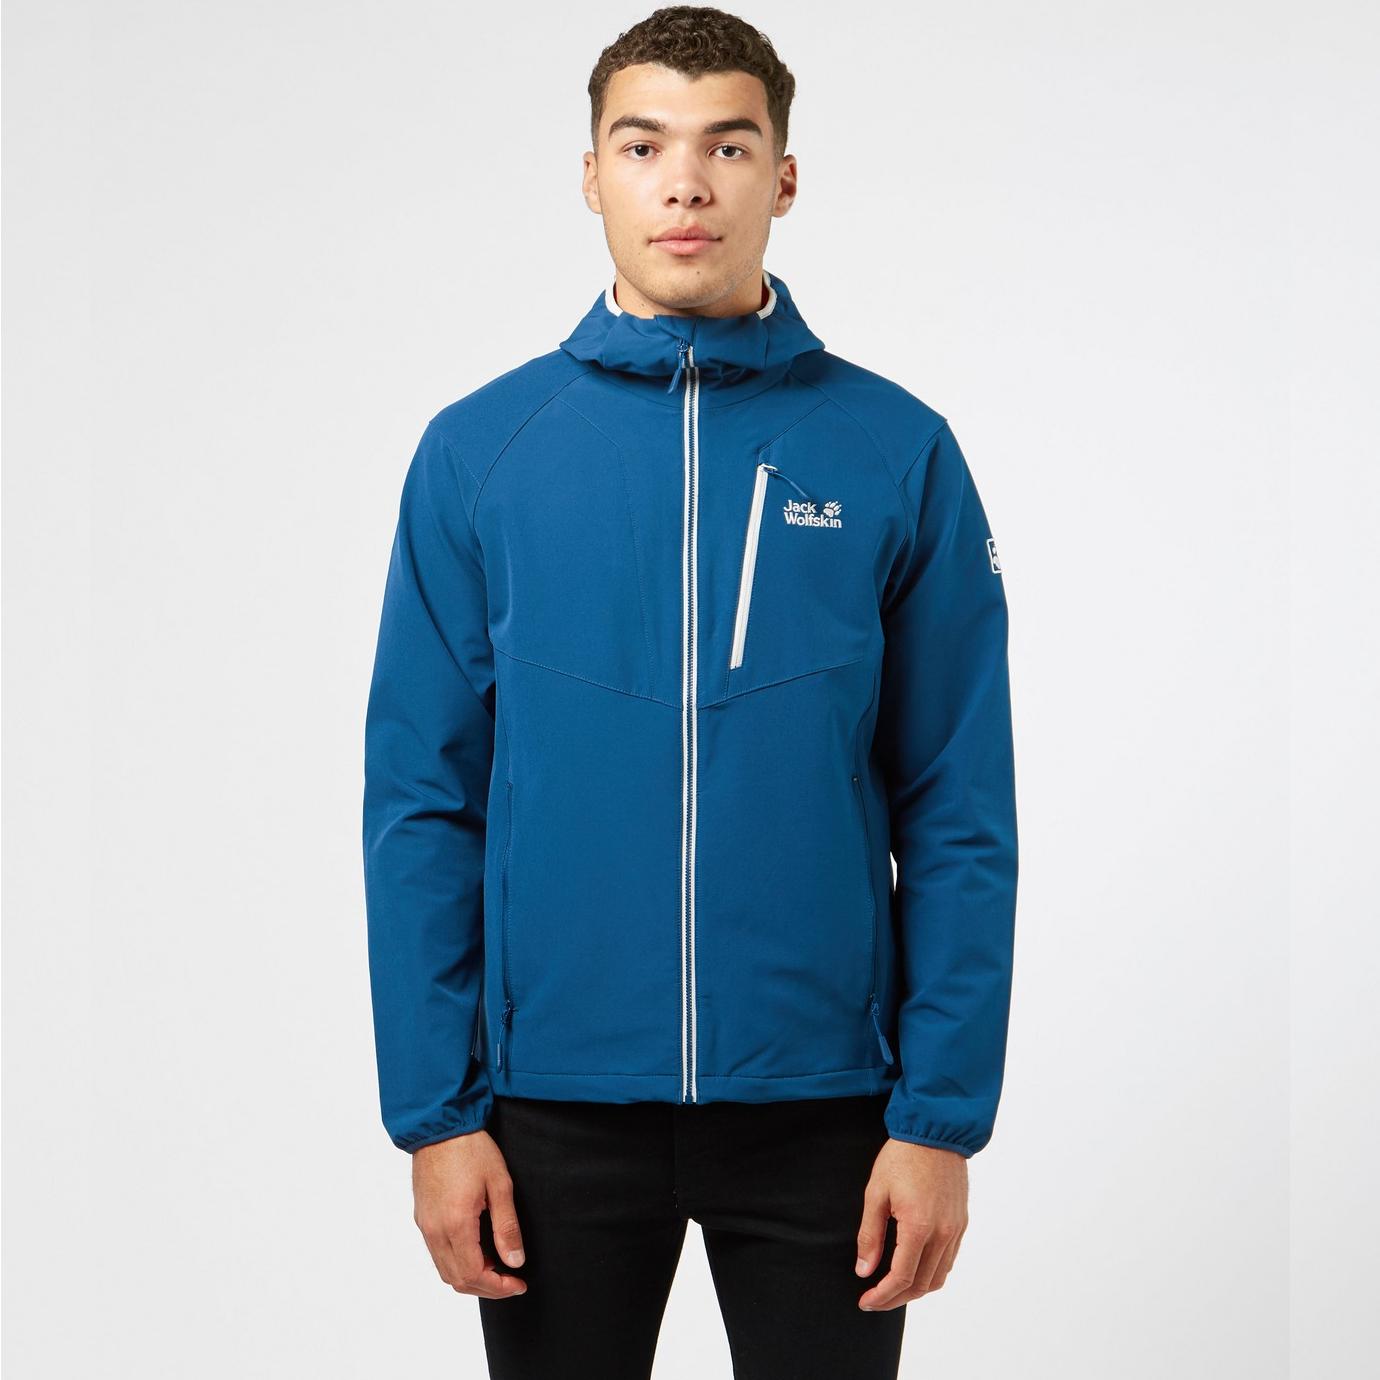 Jack Wolfskin Kanuka Point Zip Through Jacket now £54.10 click & collect @ Scotts Menswear